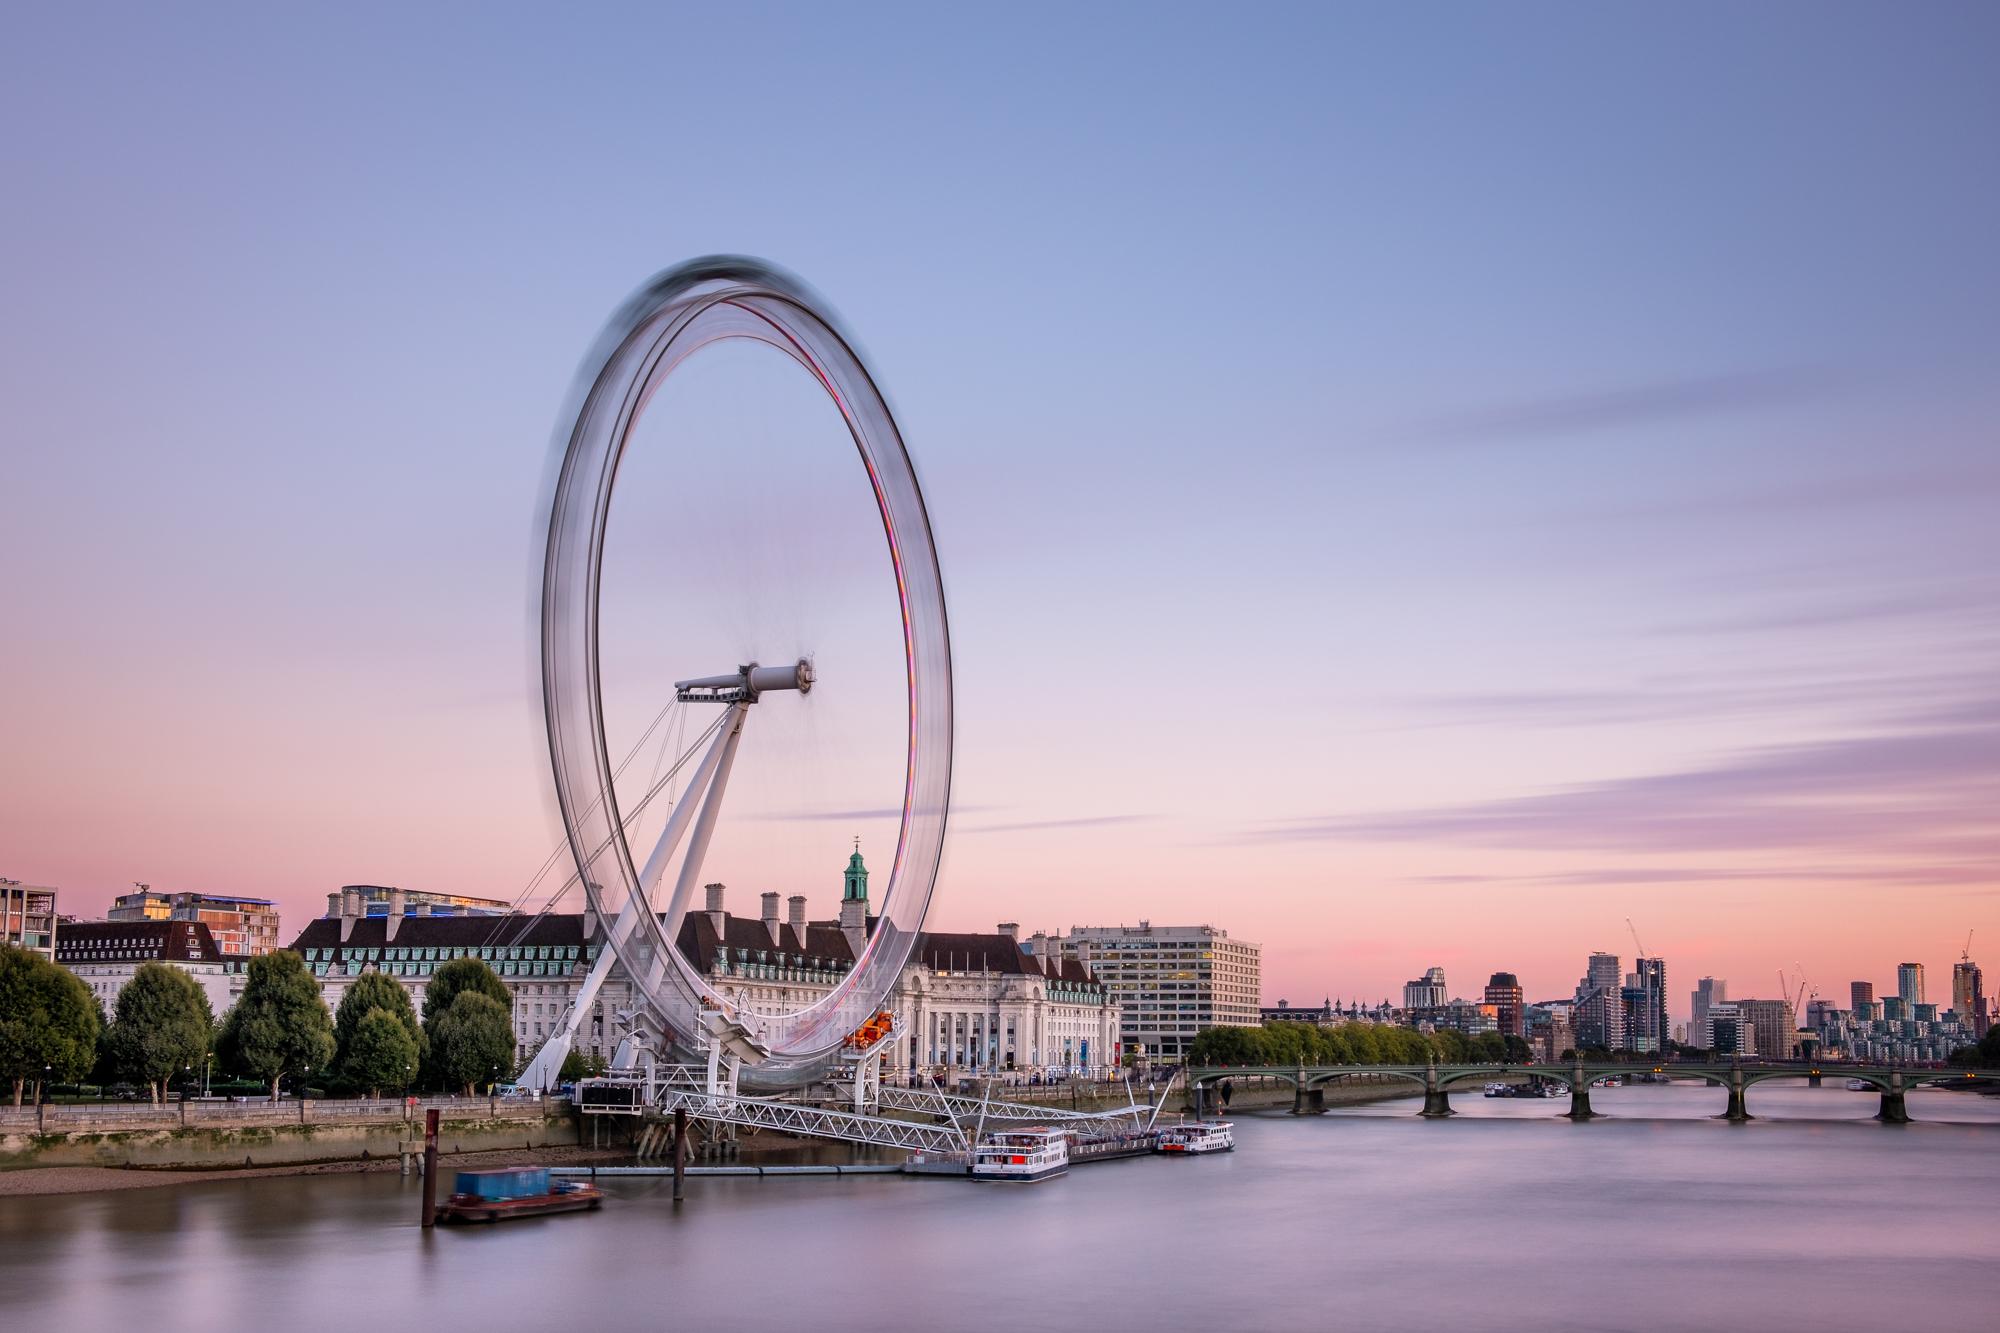 The London Eye | Fujifilm XT2 | XF18-55mm | 24mm | 121 Seconds | f/10 | ISO200